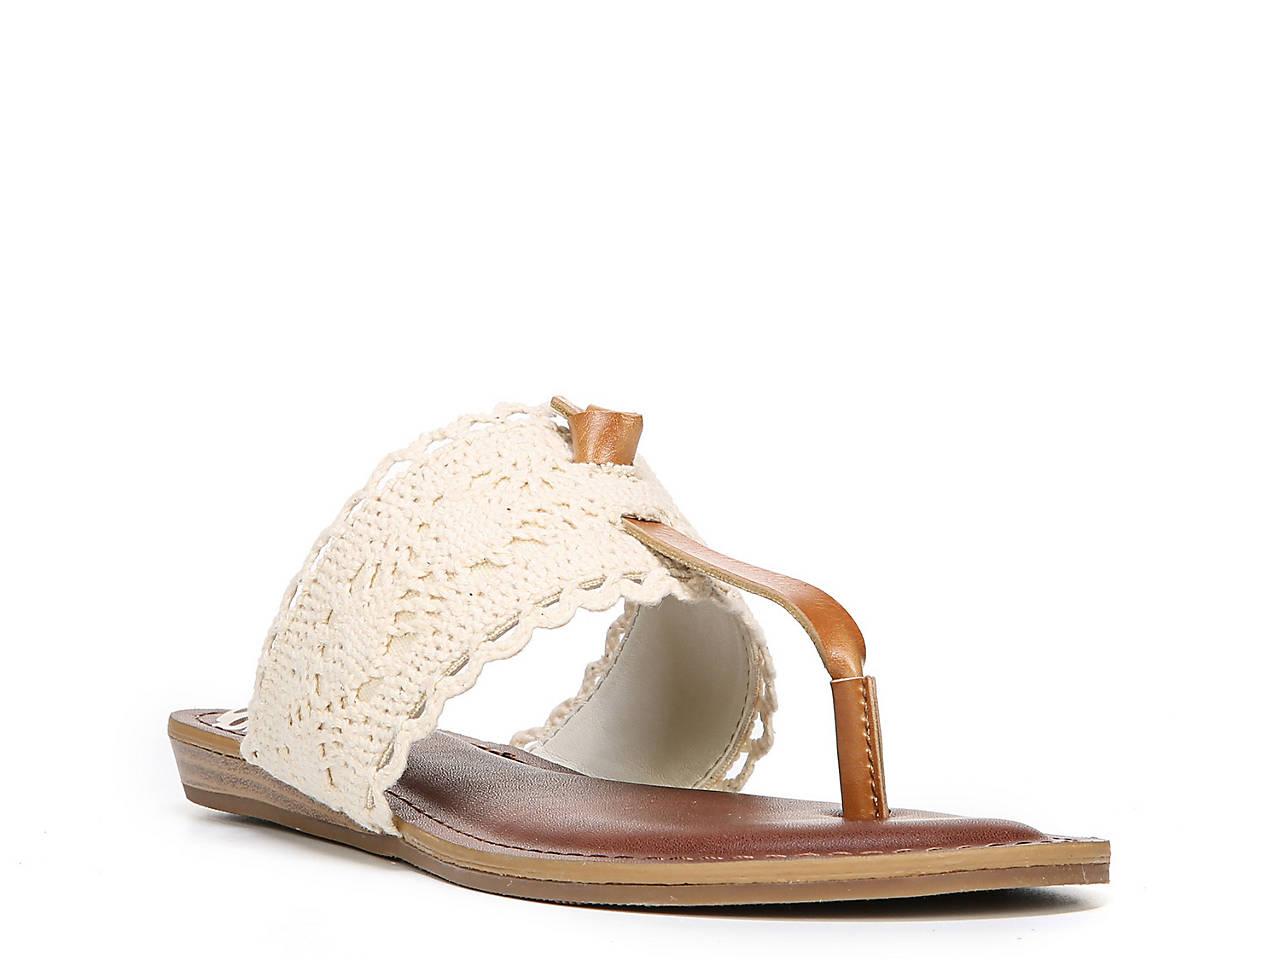 84c7b275006 Fergalicious Stella Flat Sandal Women s Shoes